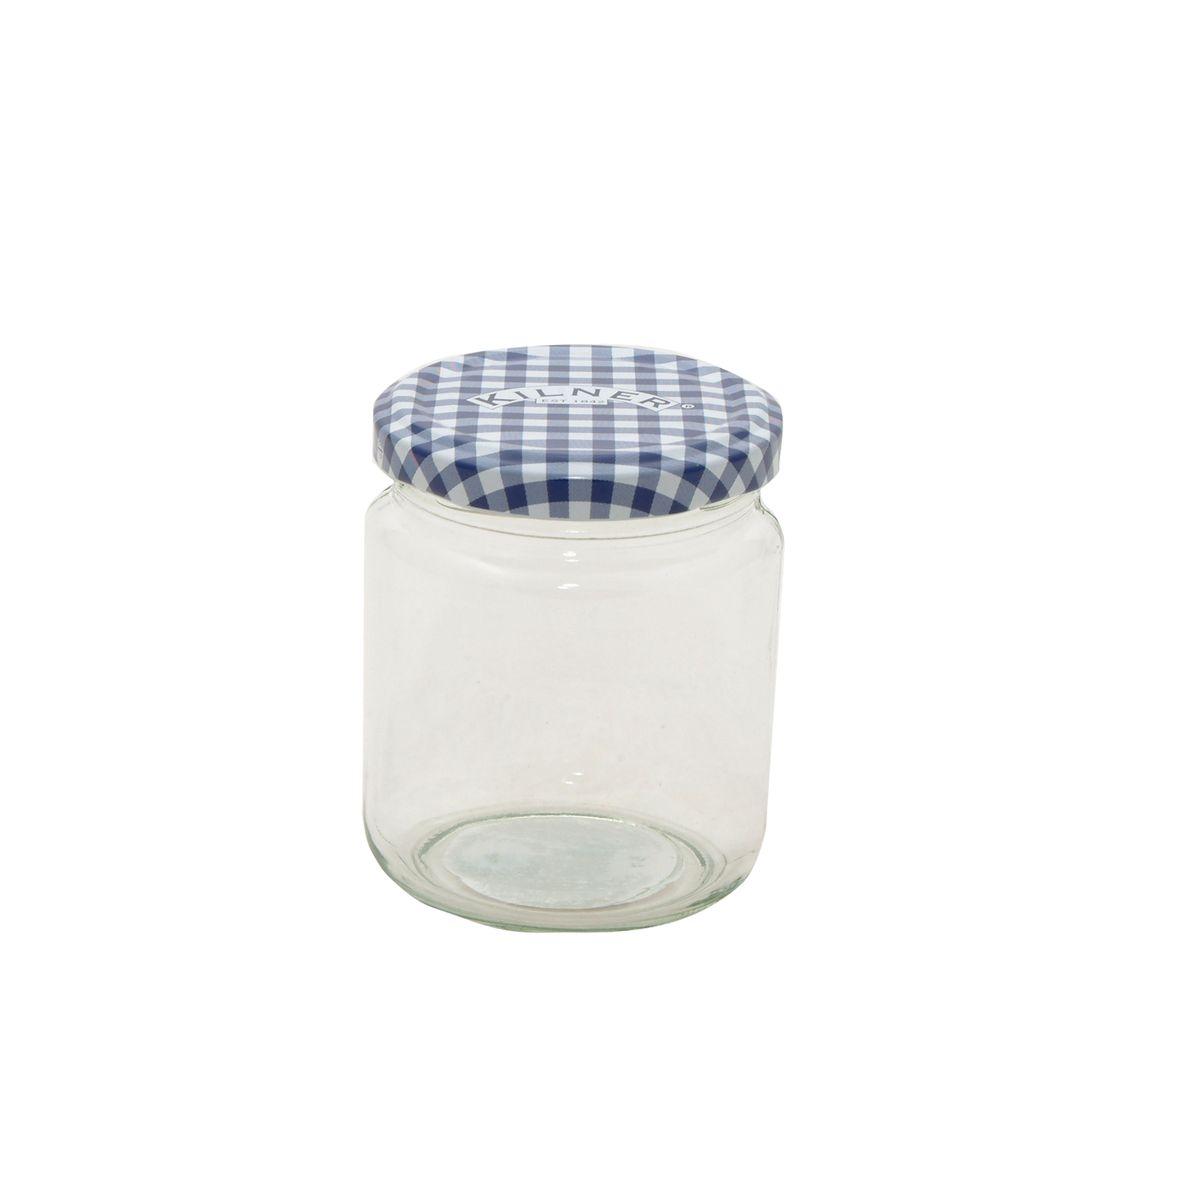 Pot à confiture 228ml - Kilner